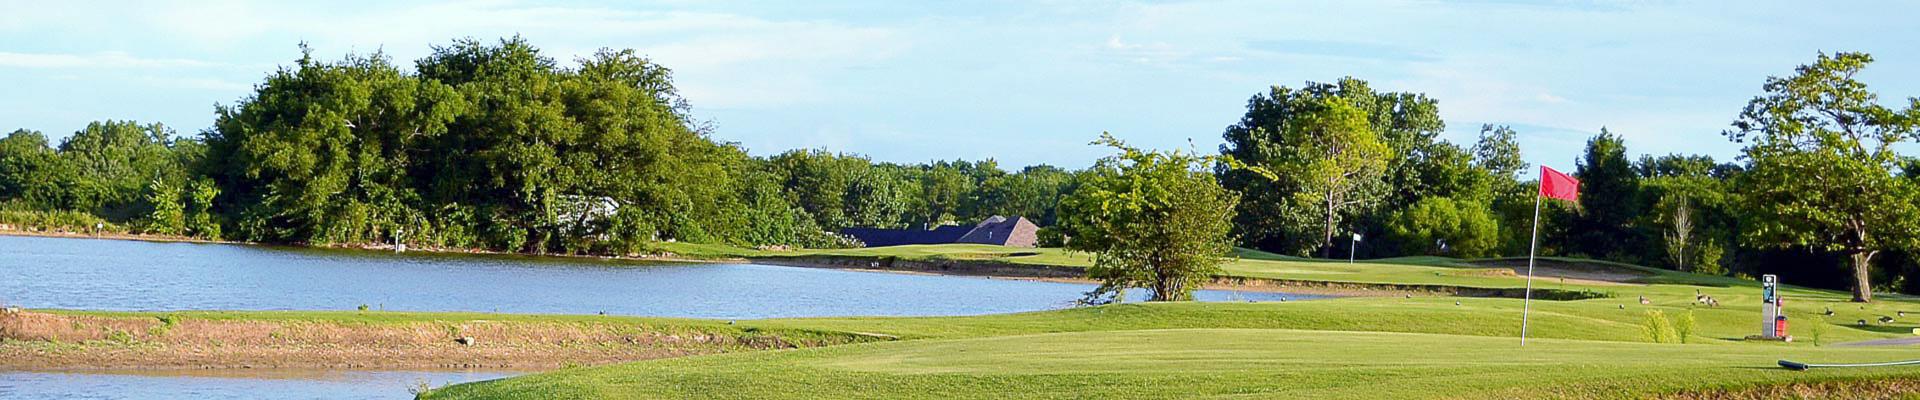 Privacy Policy | Cottonwood Golf Club